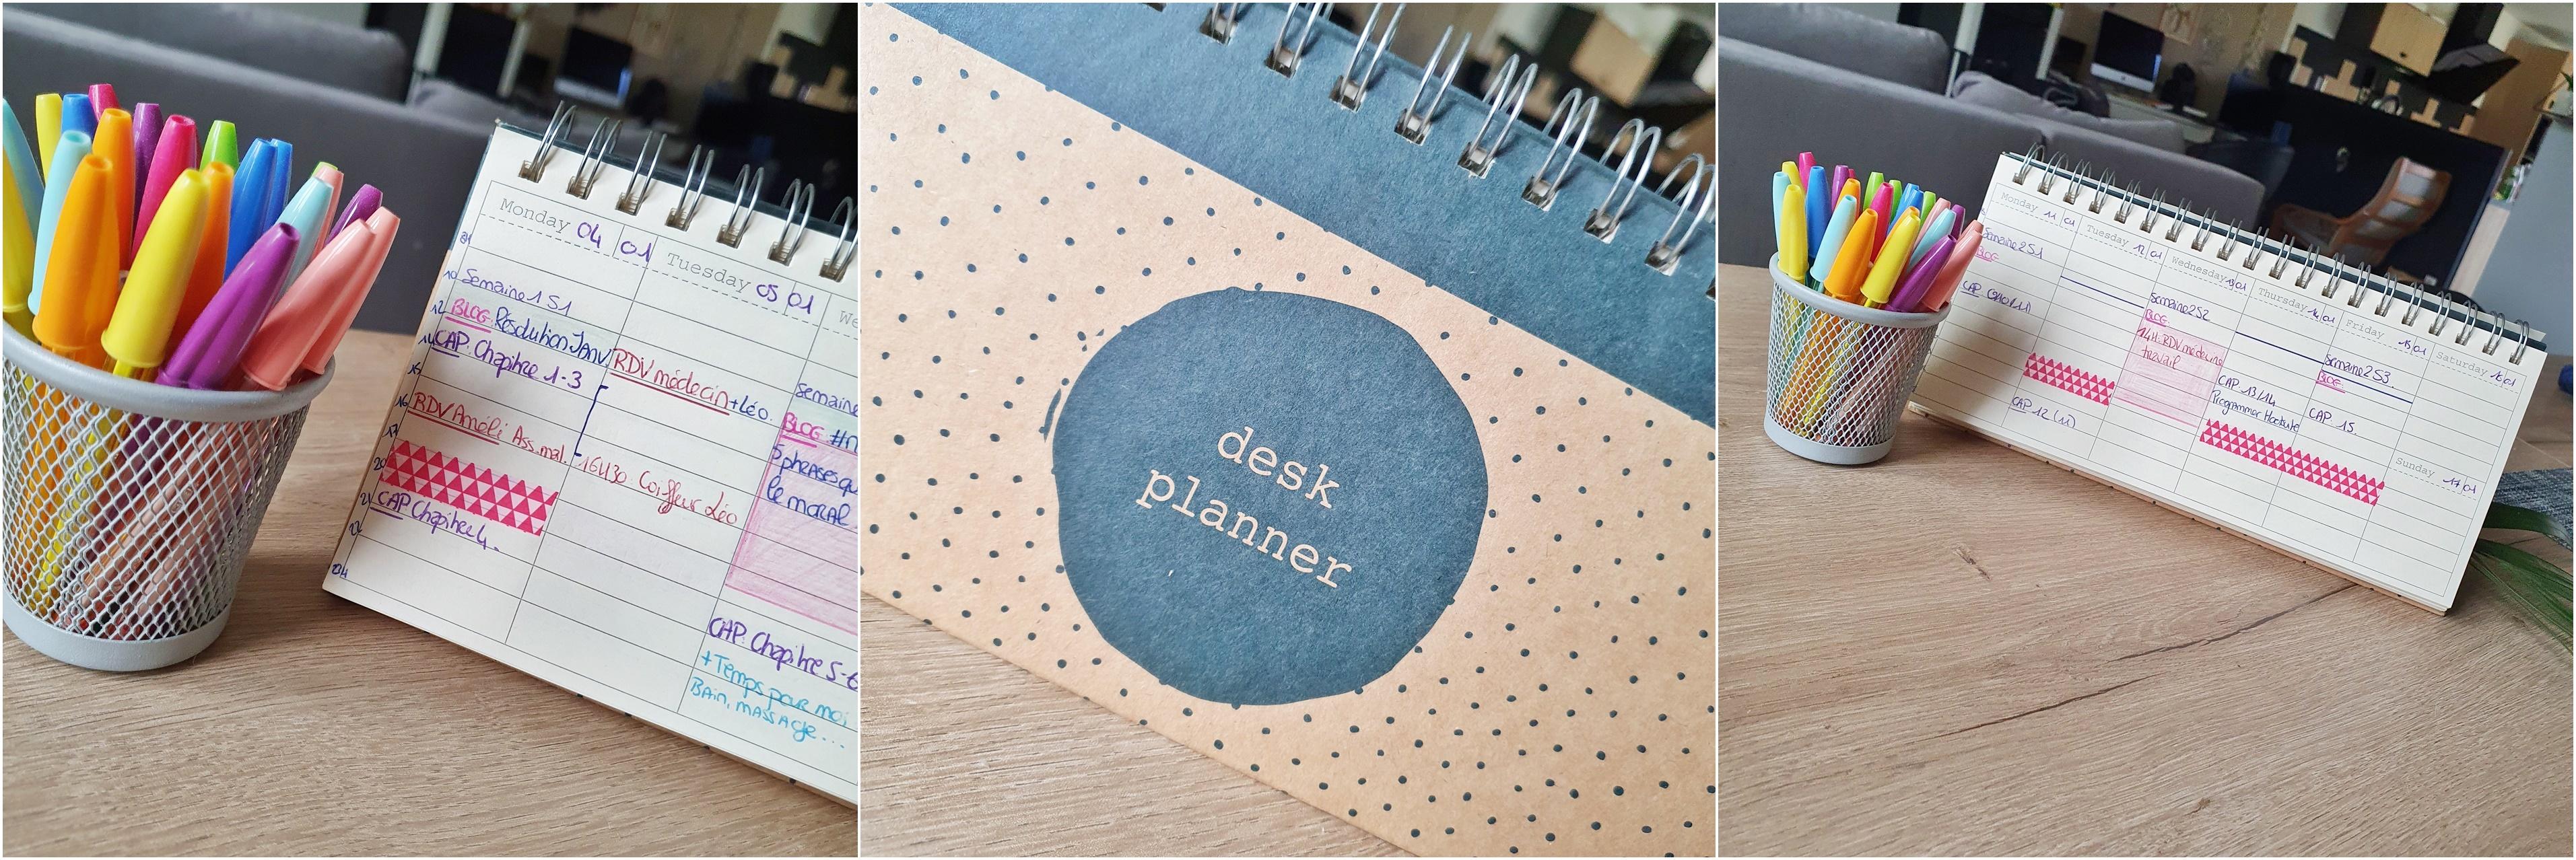 desk planner - www.makemyutopia.com